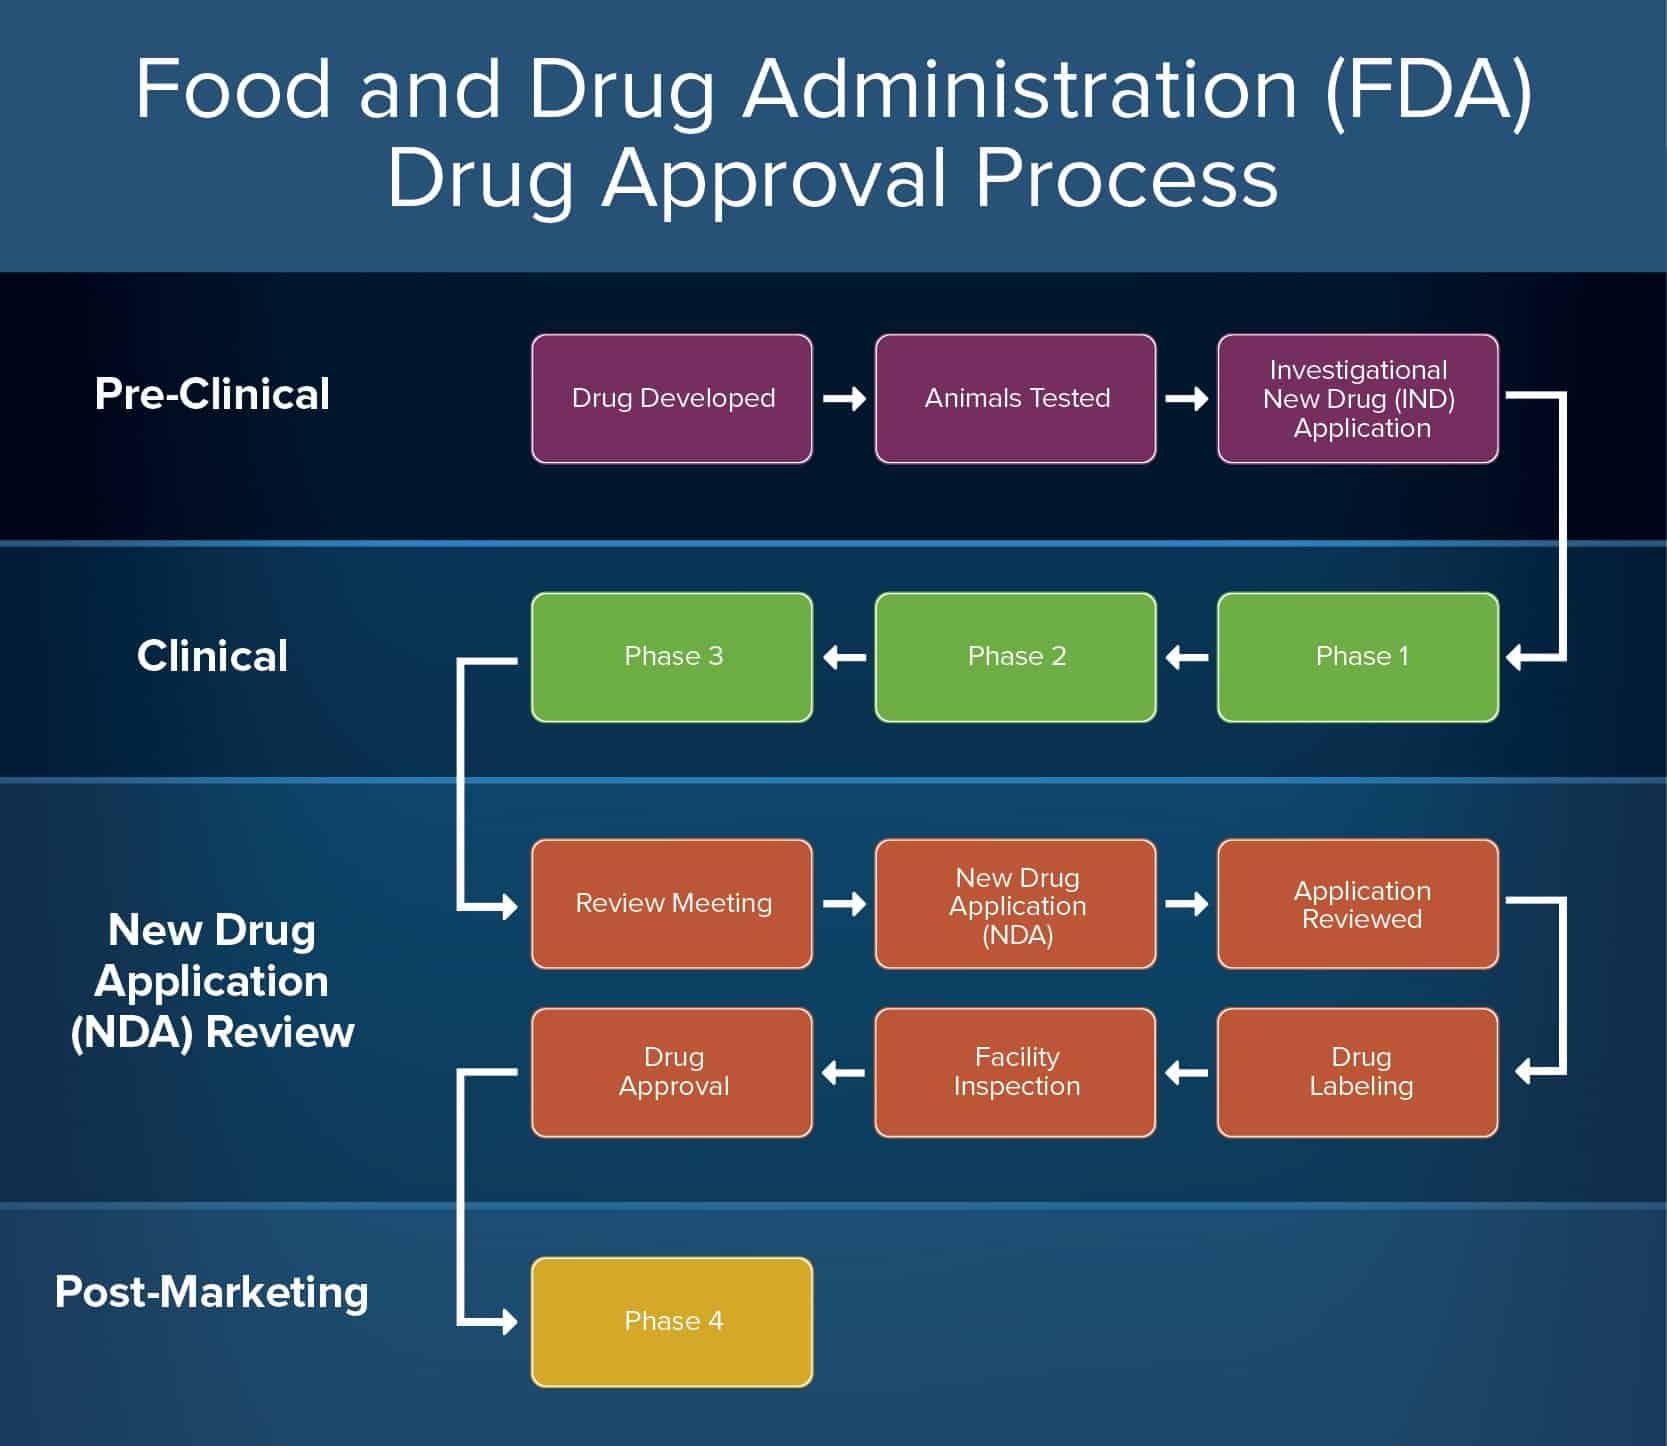 FDA Drug Approval Process Infographic Horizontal